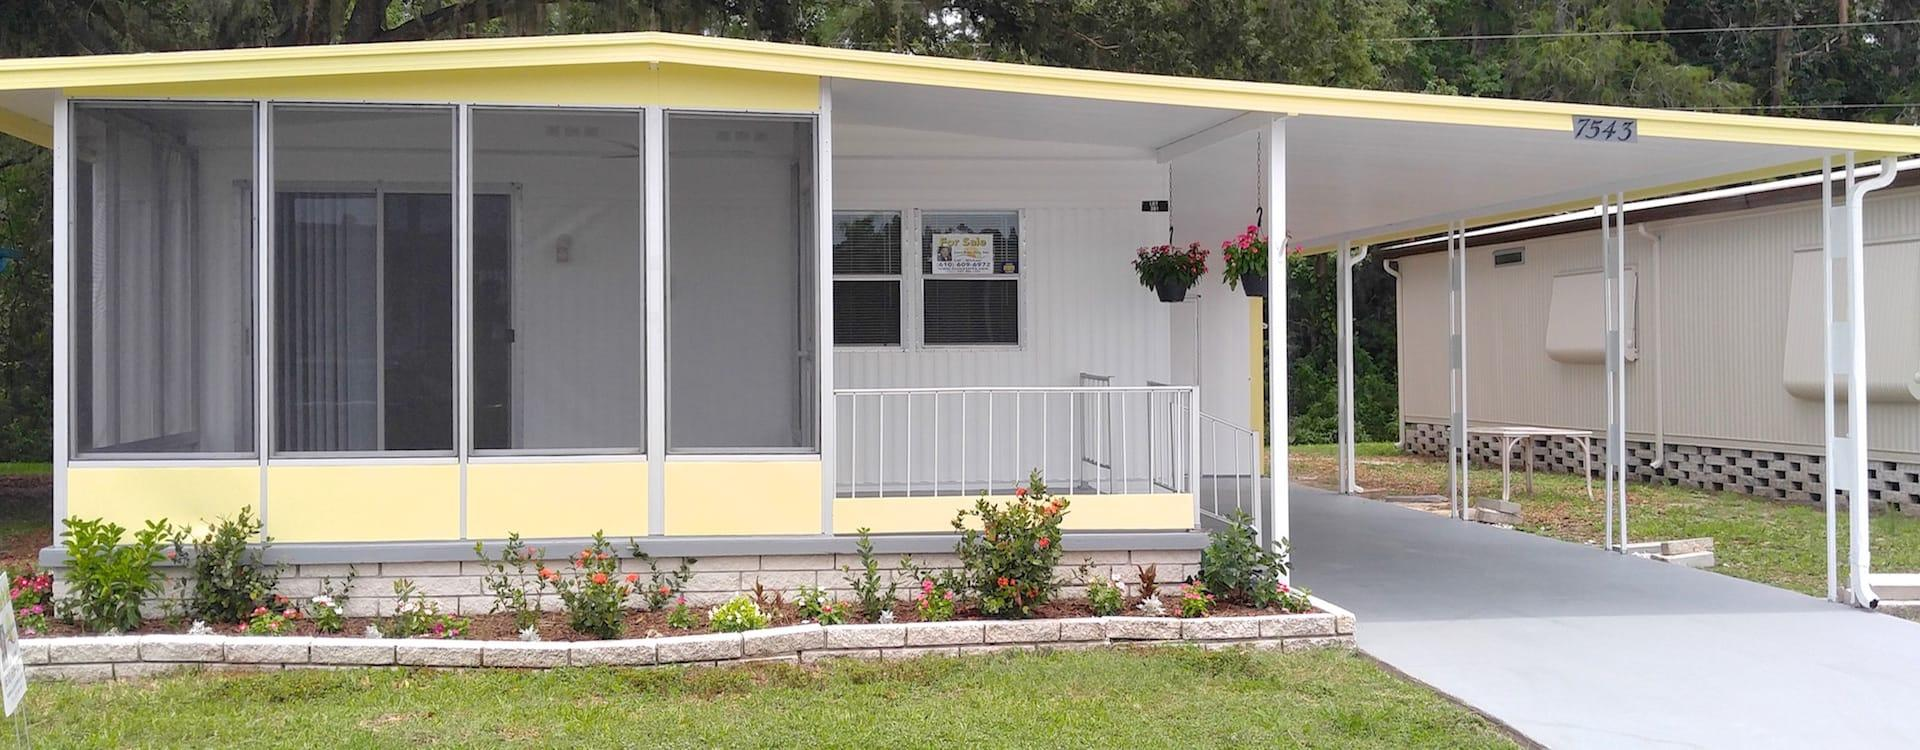 Mobile Homes For Sale Hacienda Village New Port Richey Fl